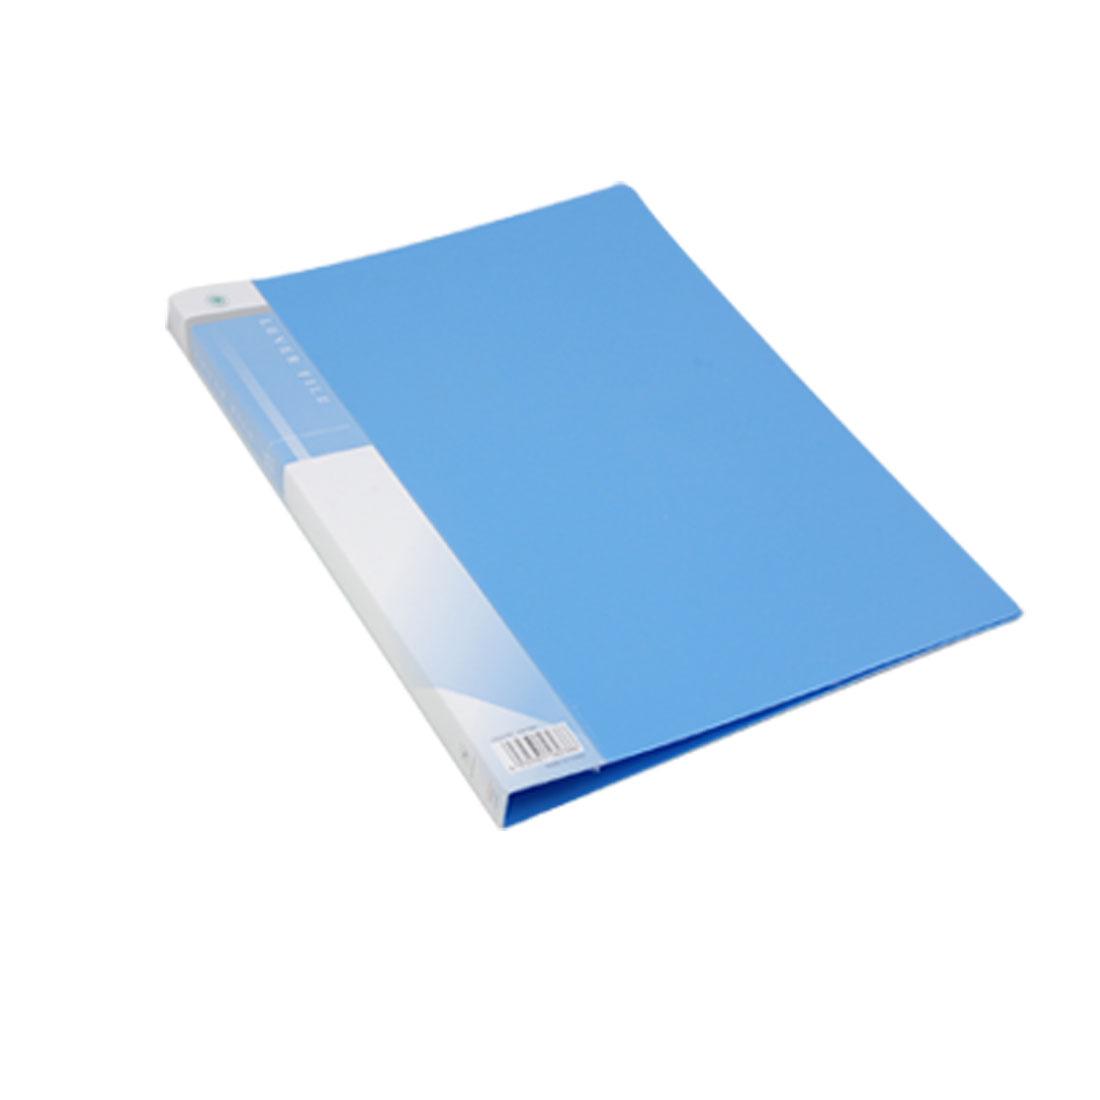 Blue Plastic Single Lever Clip Size A4 Paper File Folder